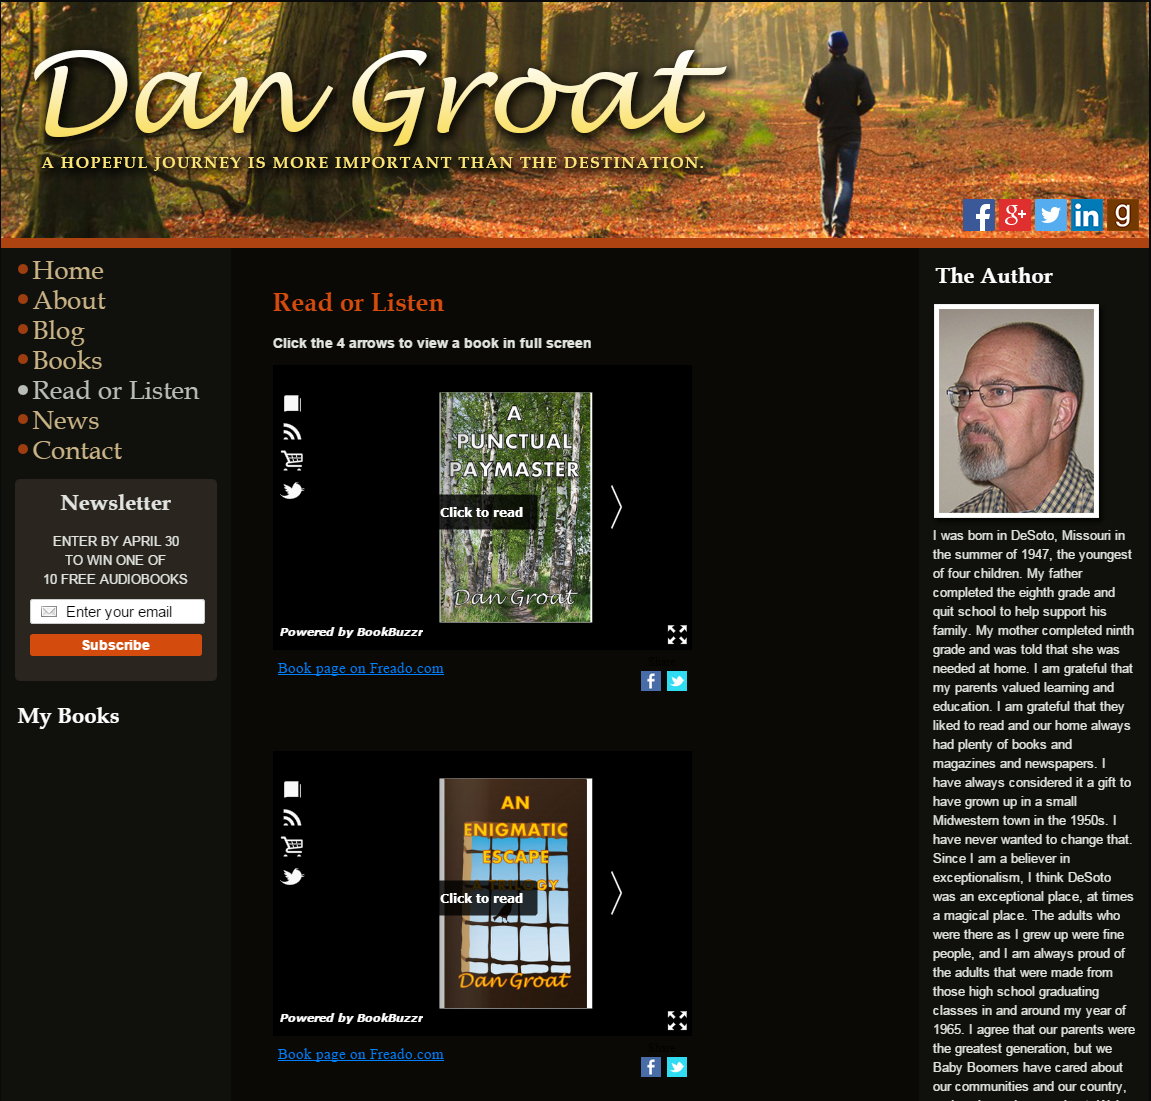 Dan Groat - Monarchs and Mendicants